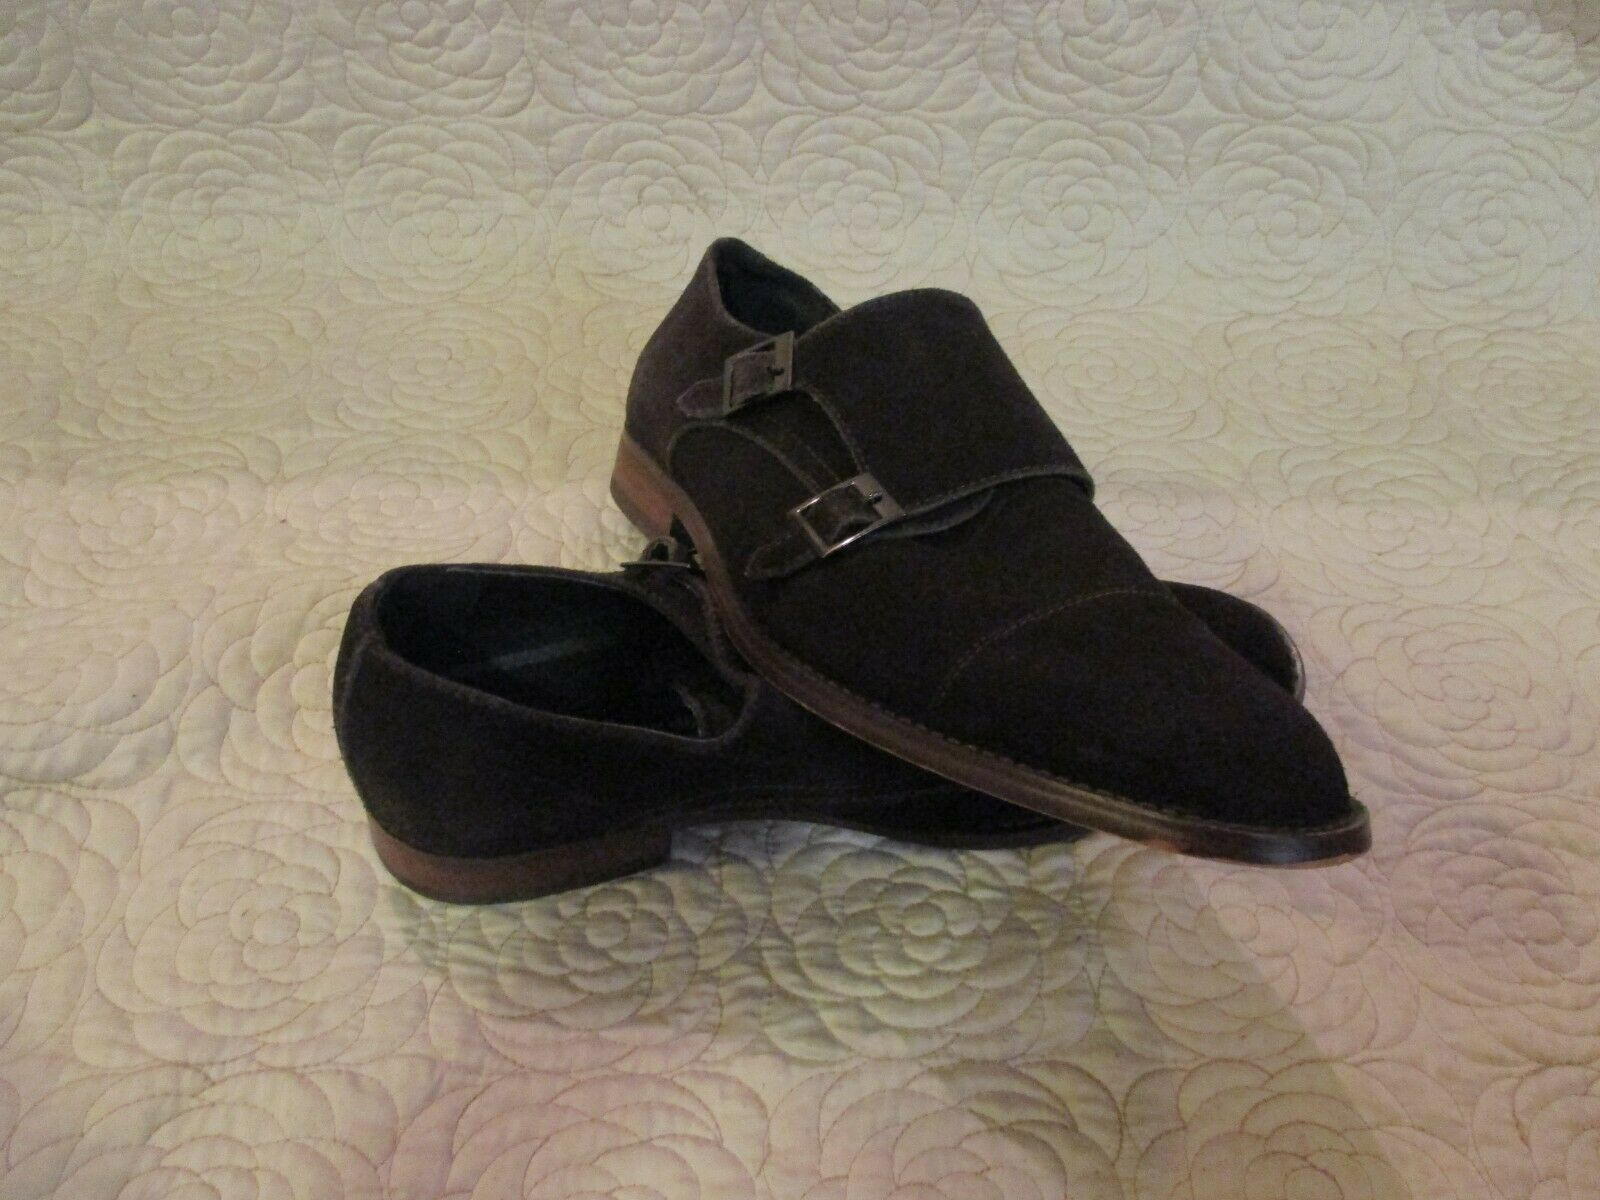 Joseph Abboud Men's Leather Double Monk Strap Loafer Dress Shoe 9